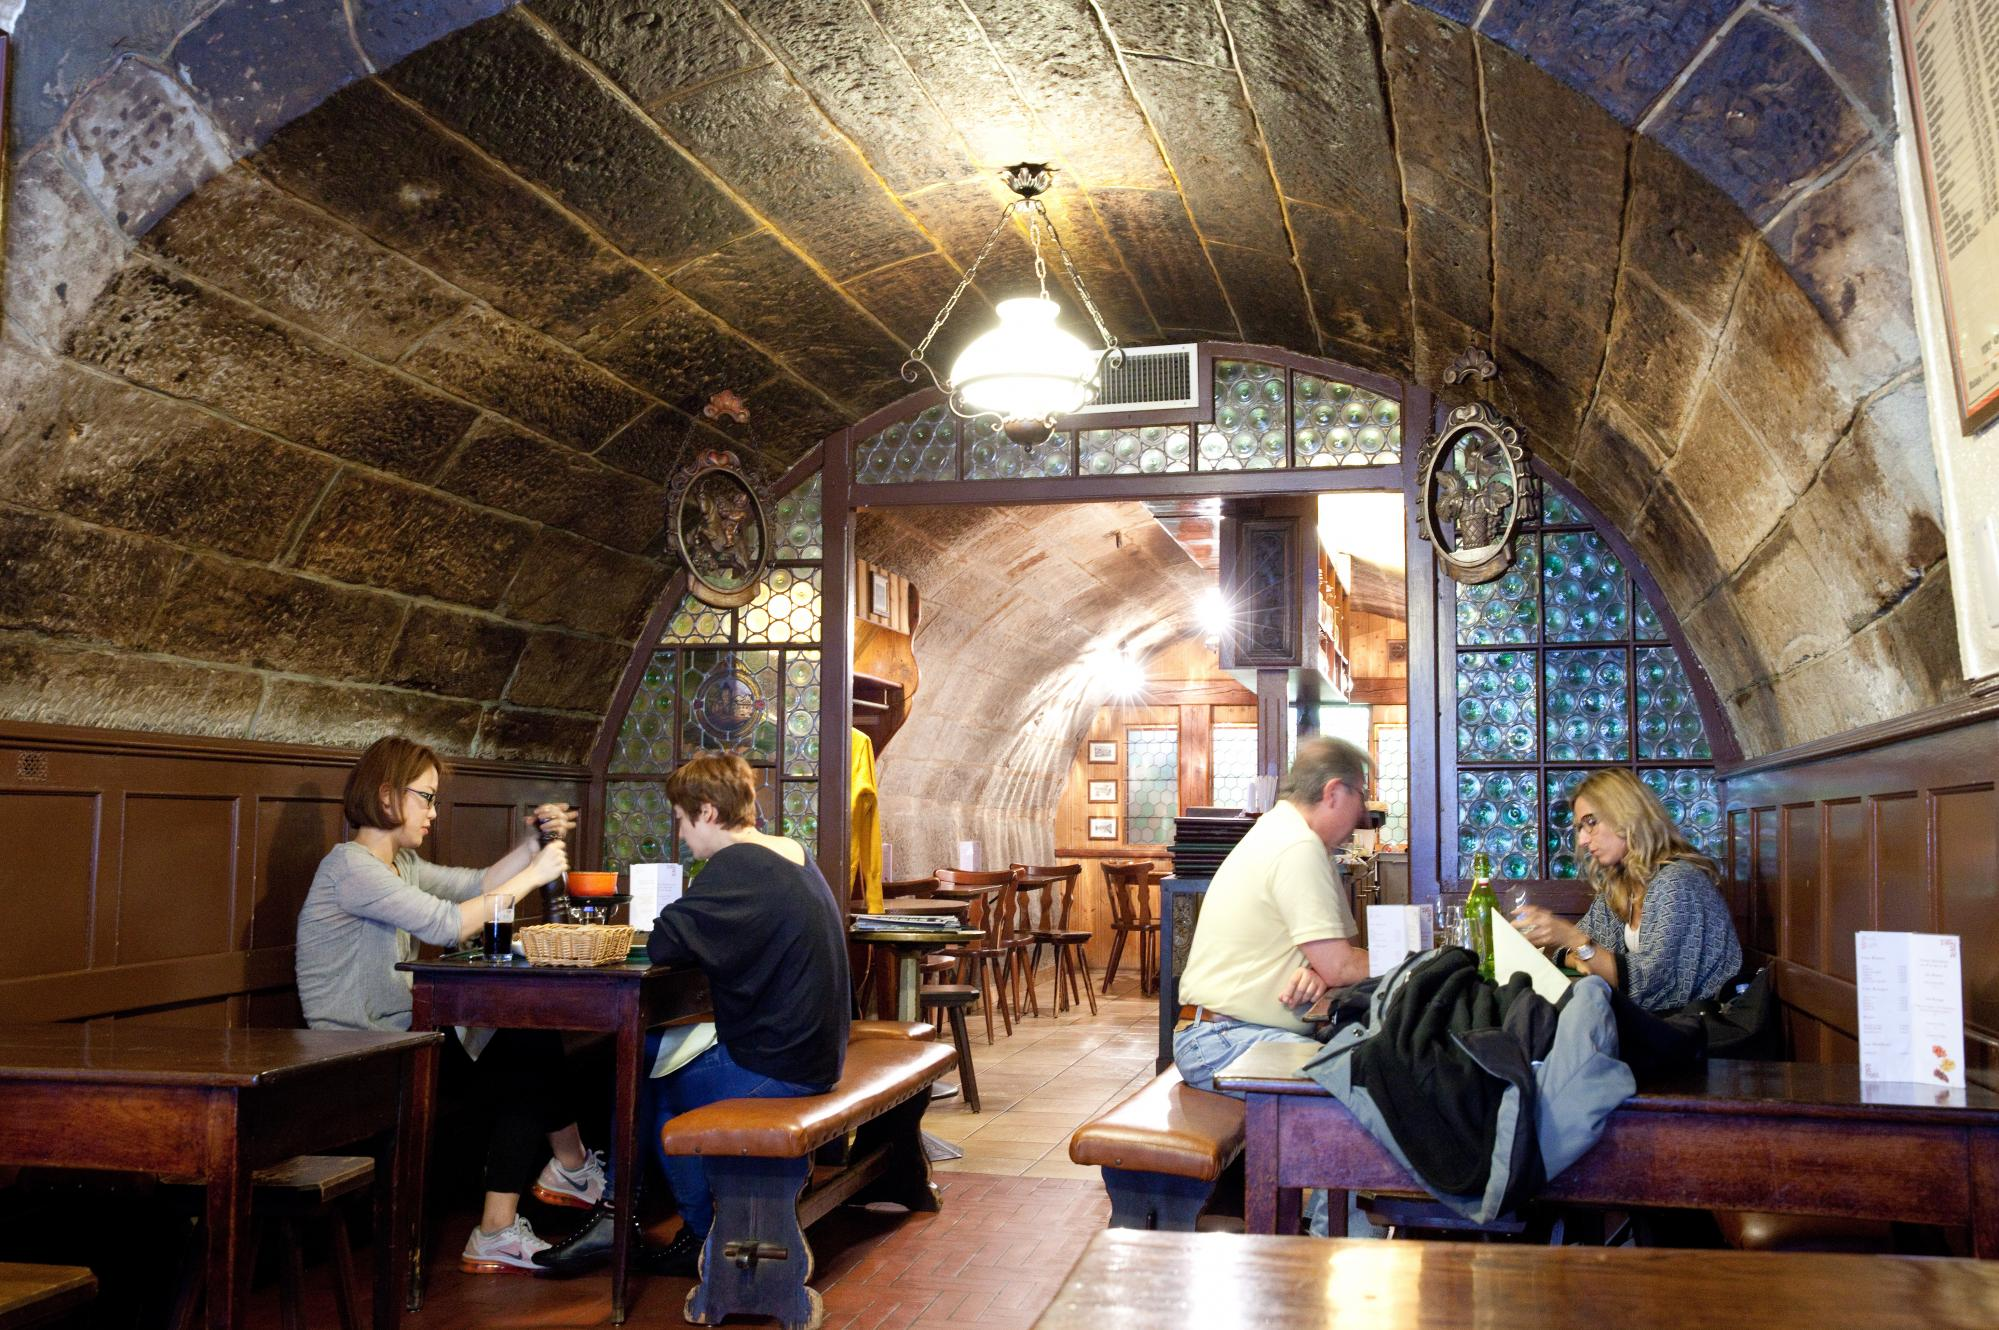 Фондю ресторант Pinte Besson в Лозана | Fondue.bg